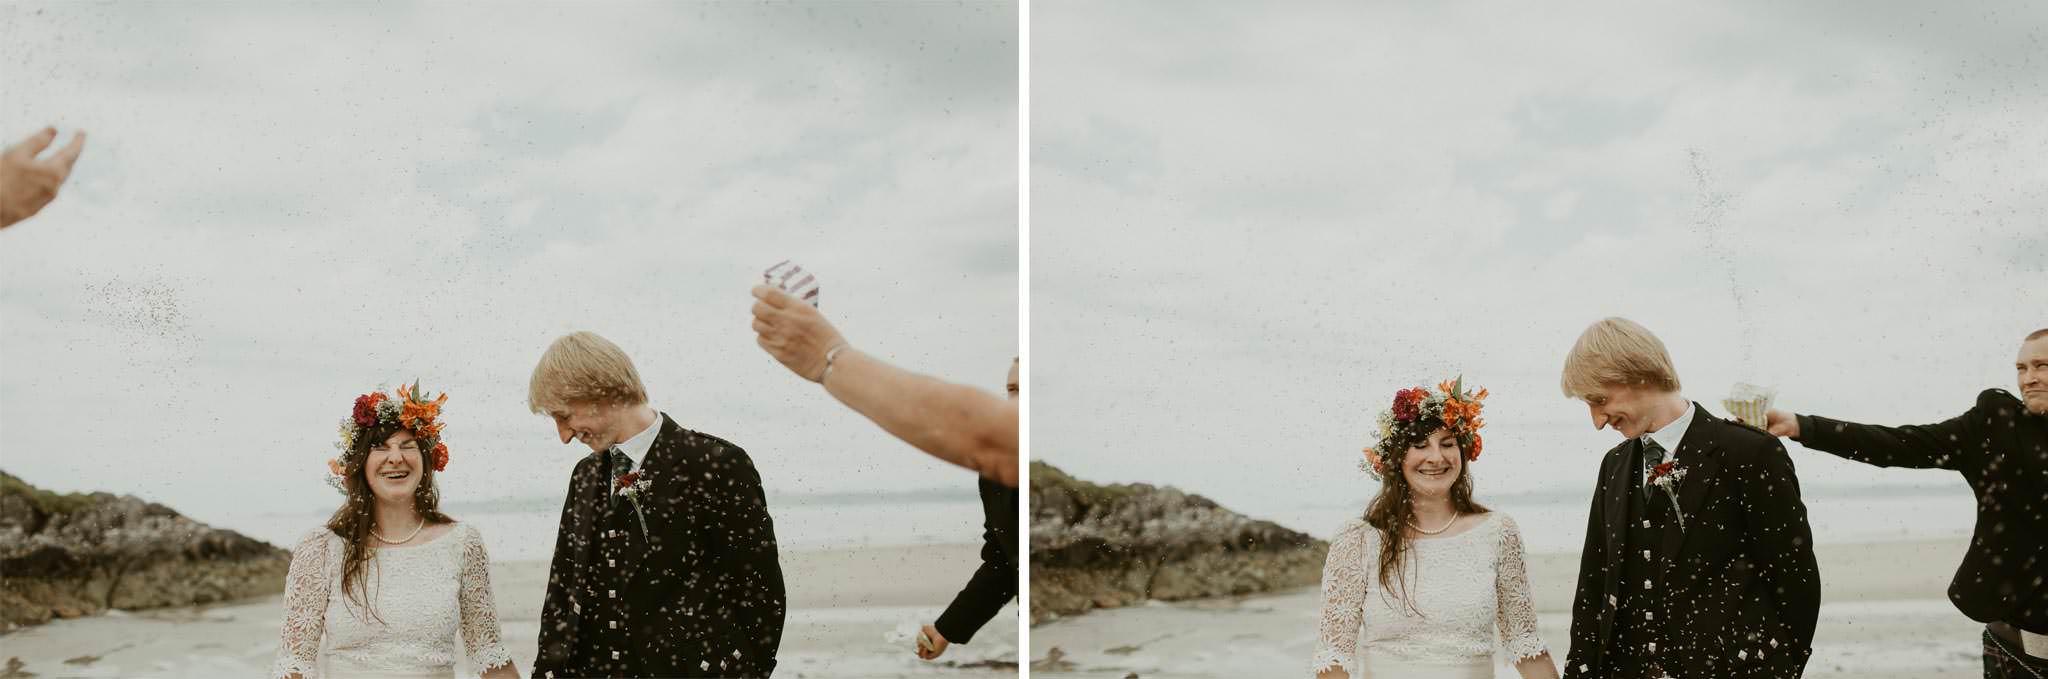 wedding-photographer-arisaig-068